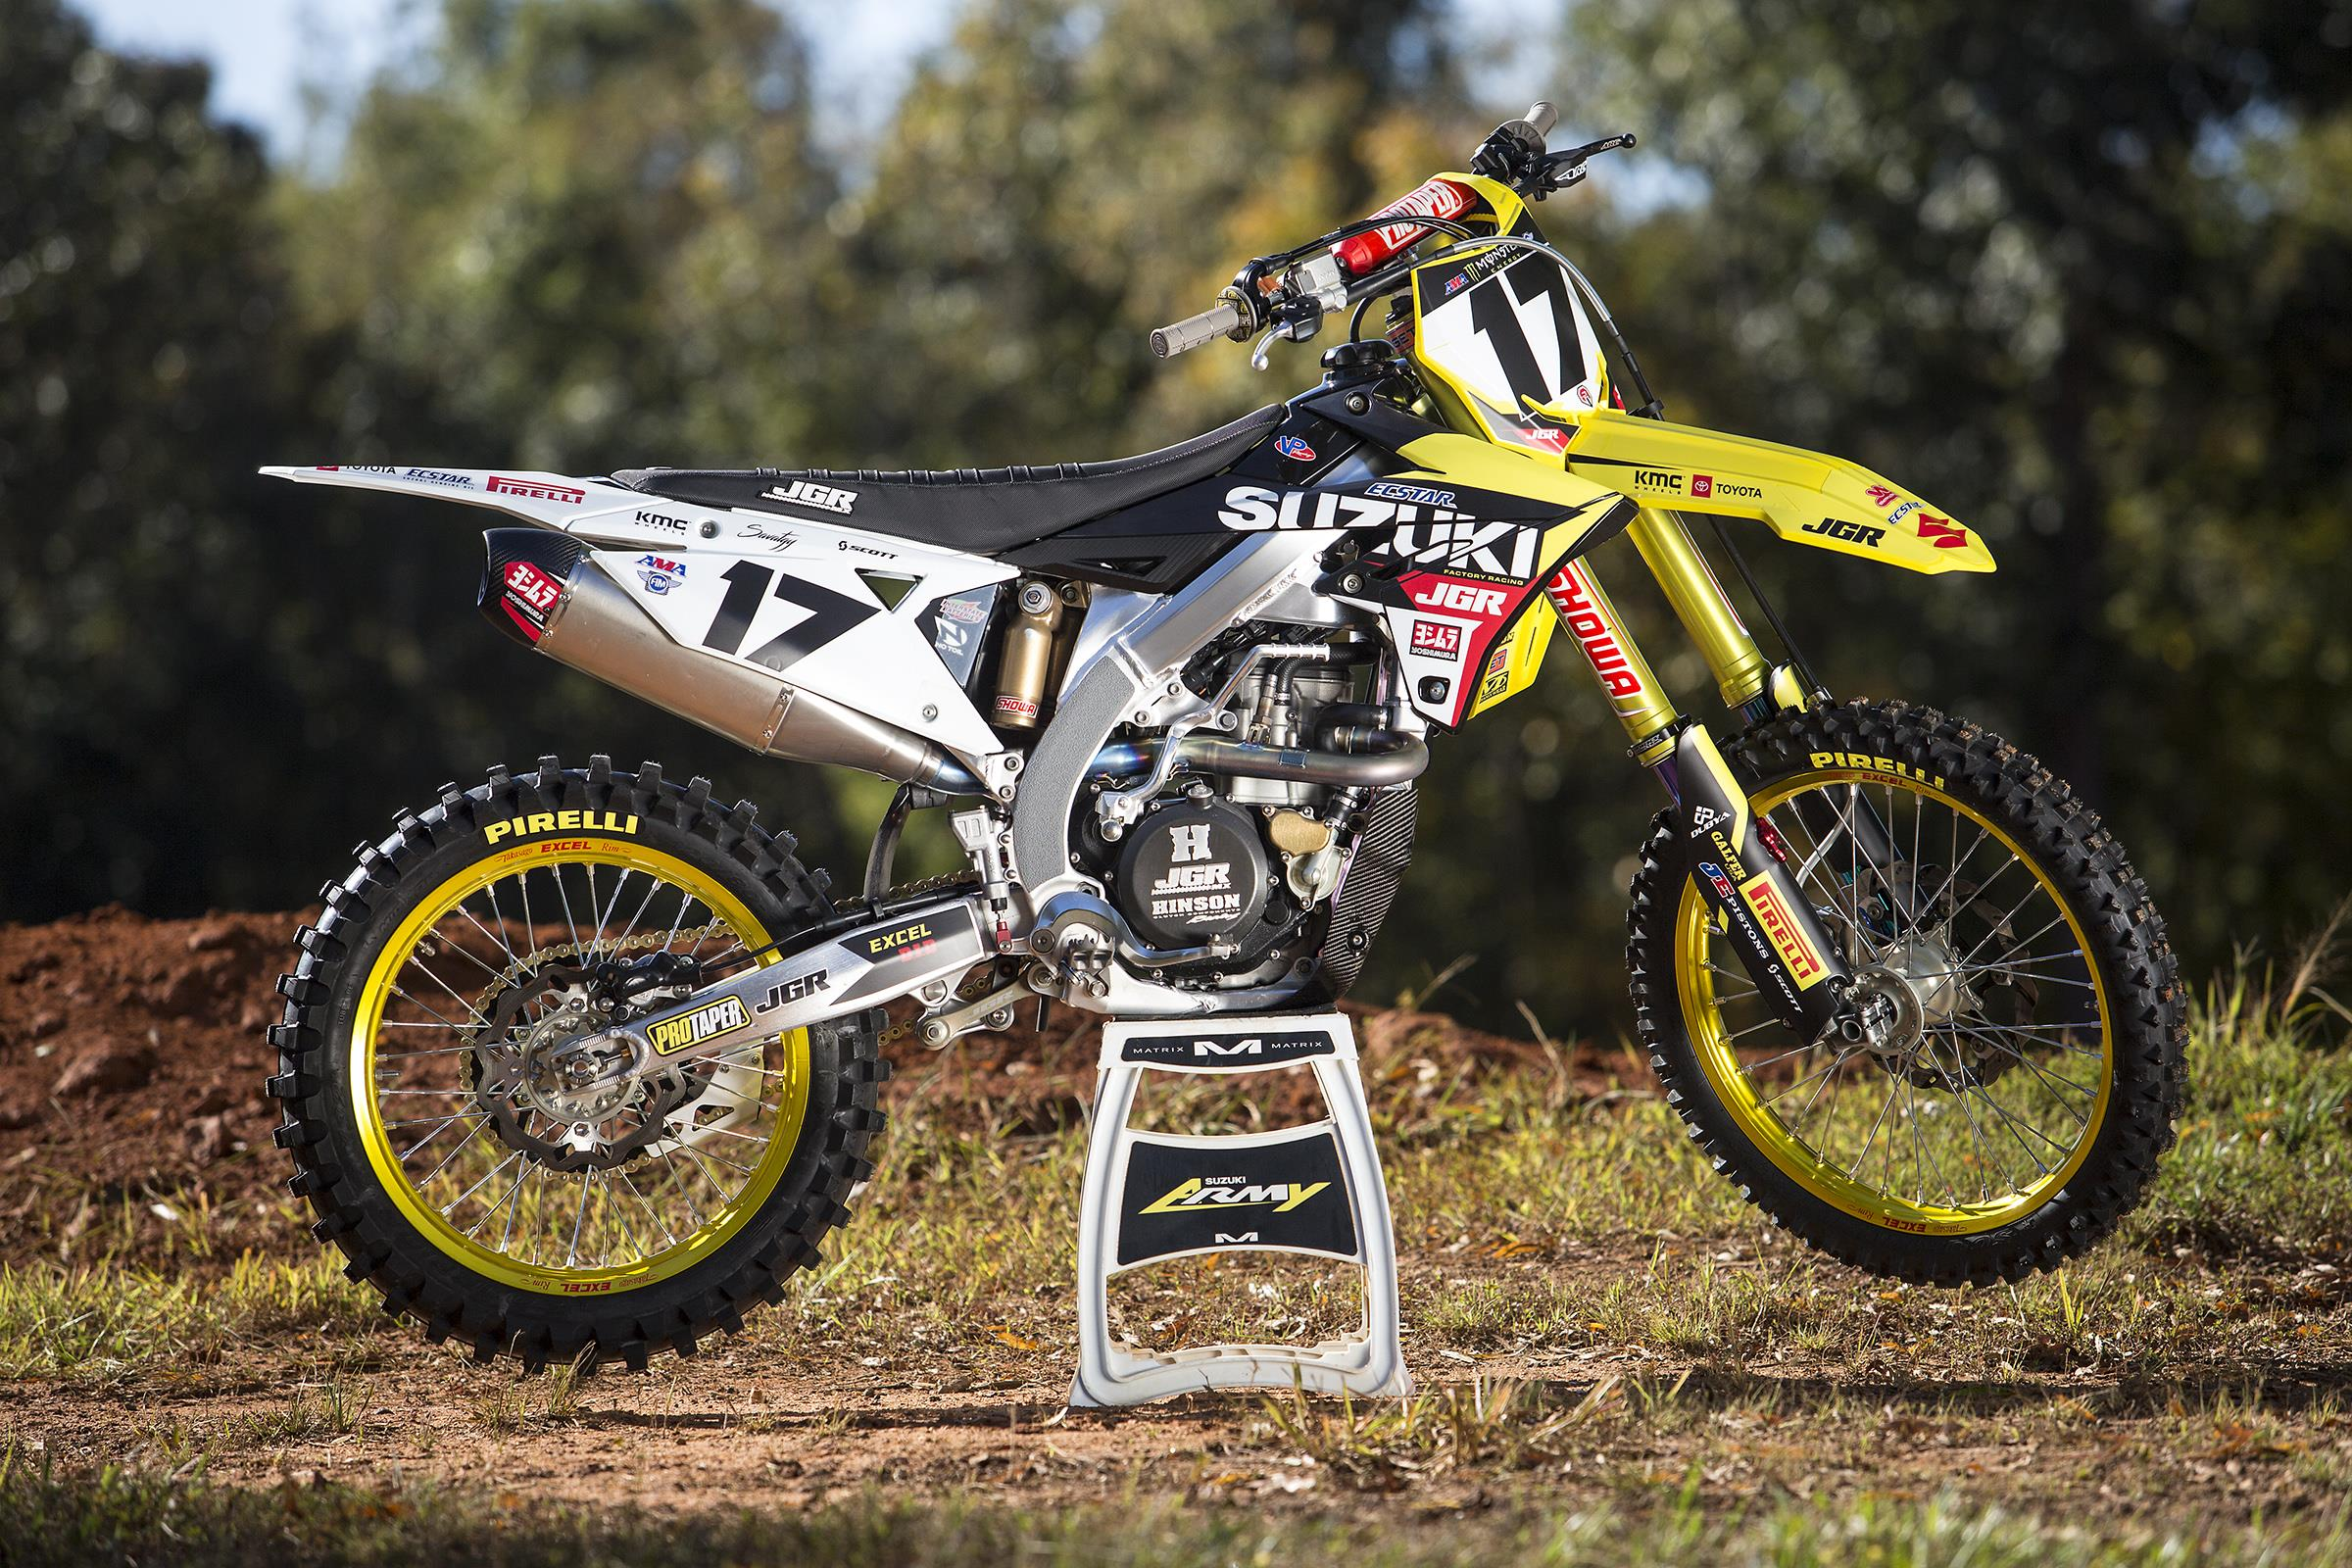 Suzuki Announces 2020 JGRMX Yoshimura Team